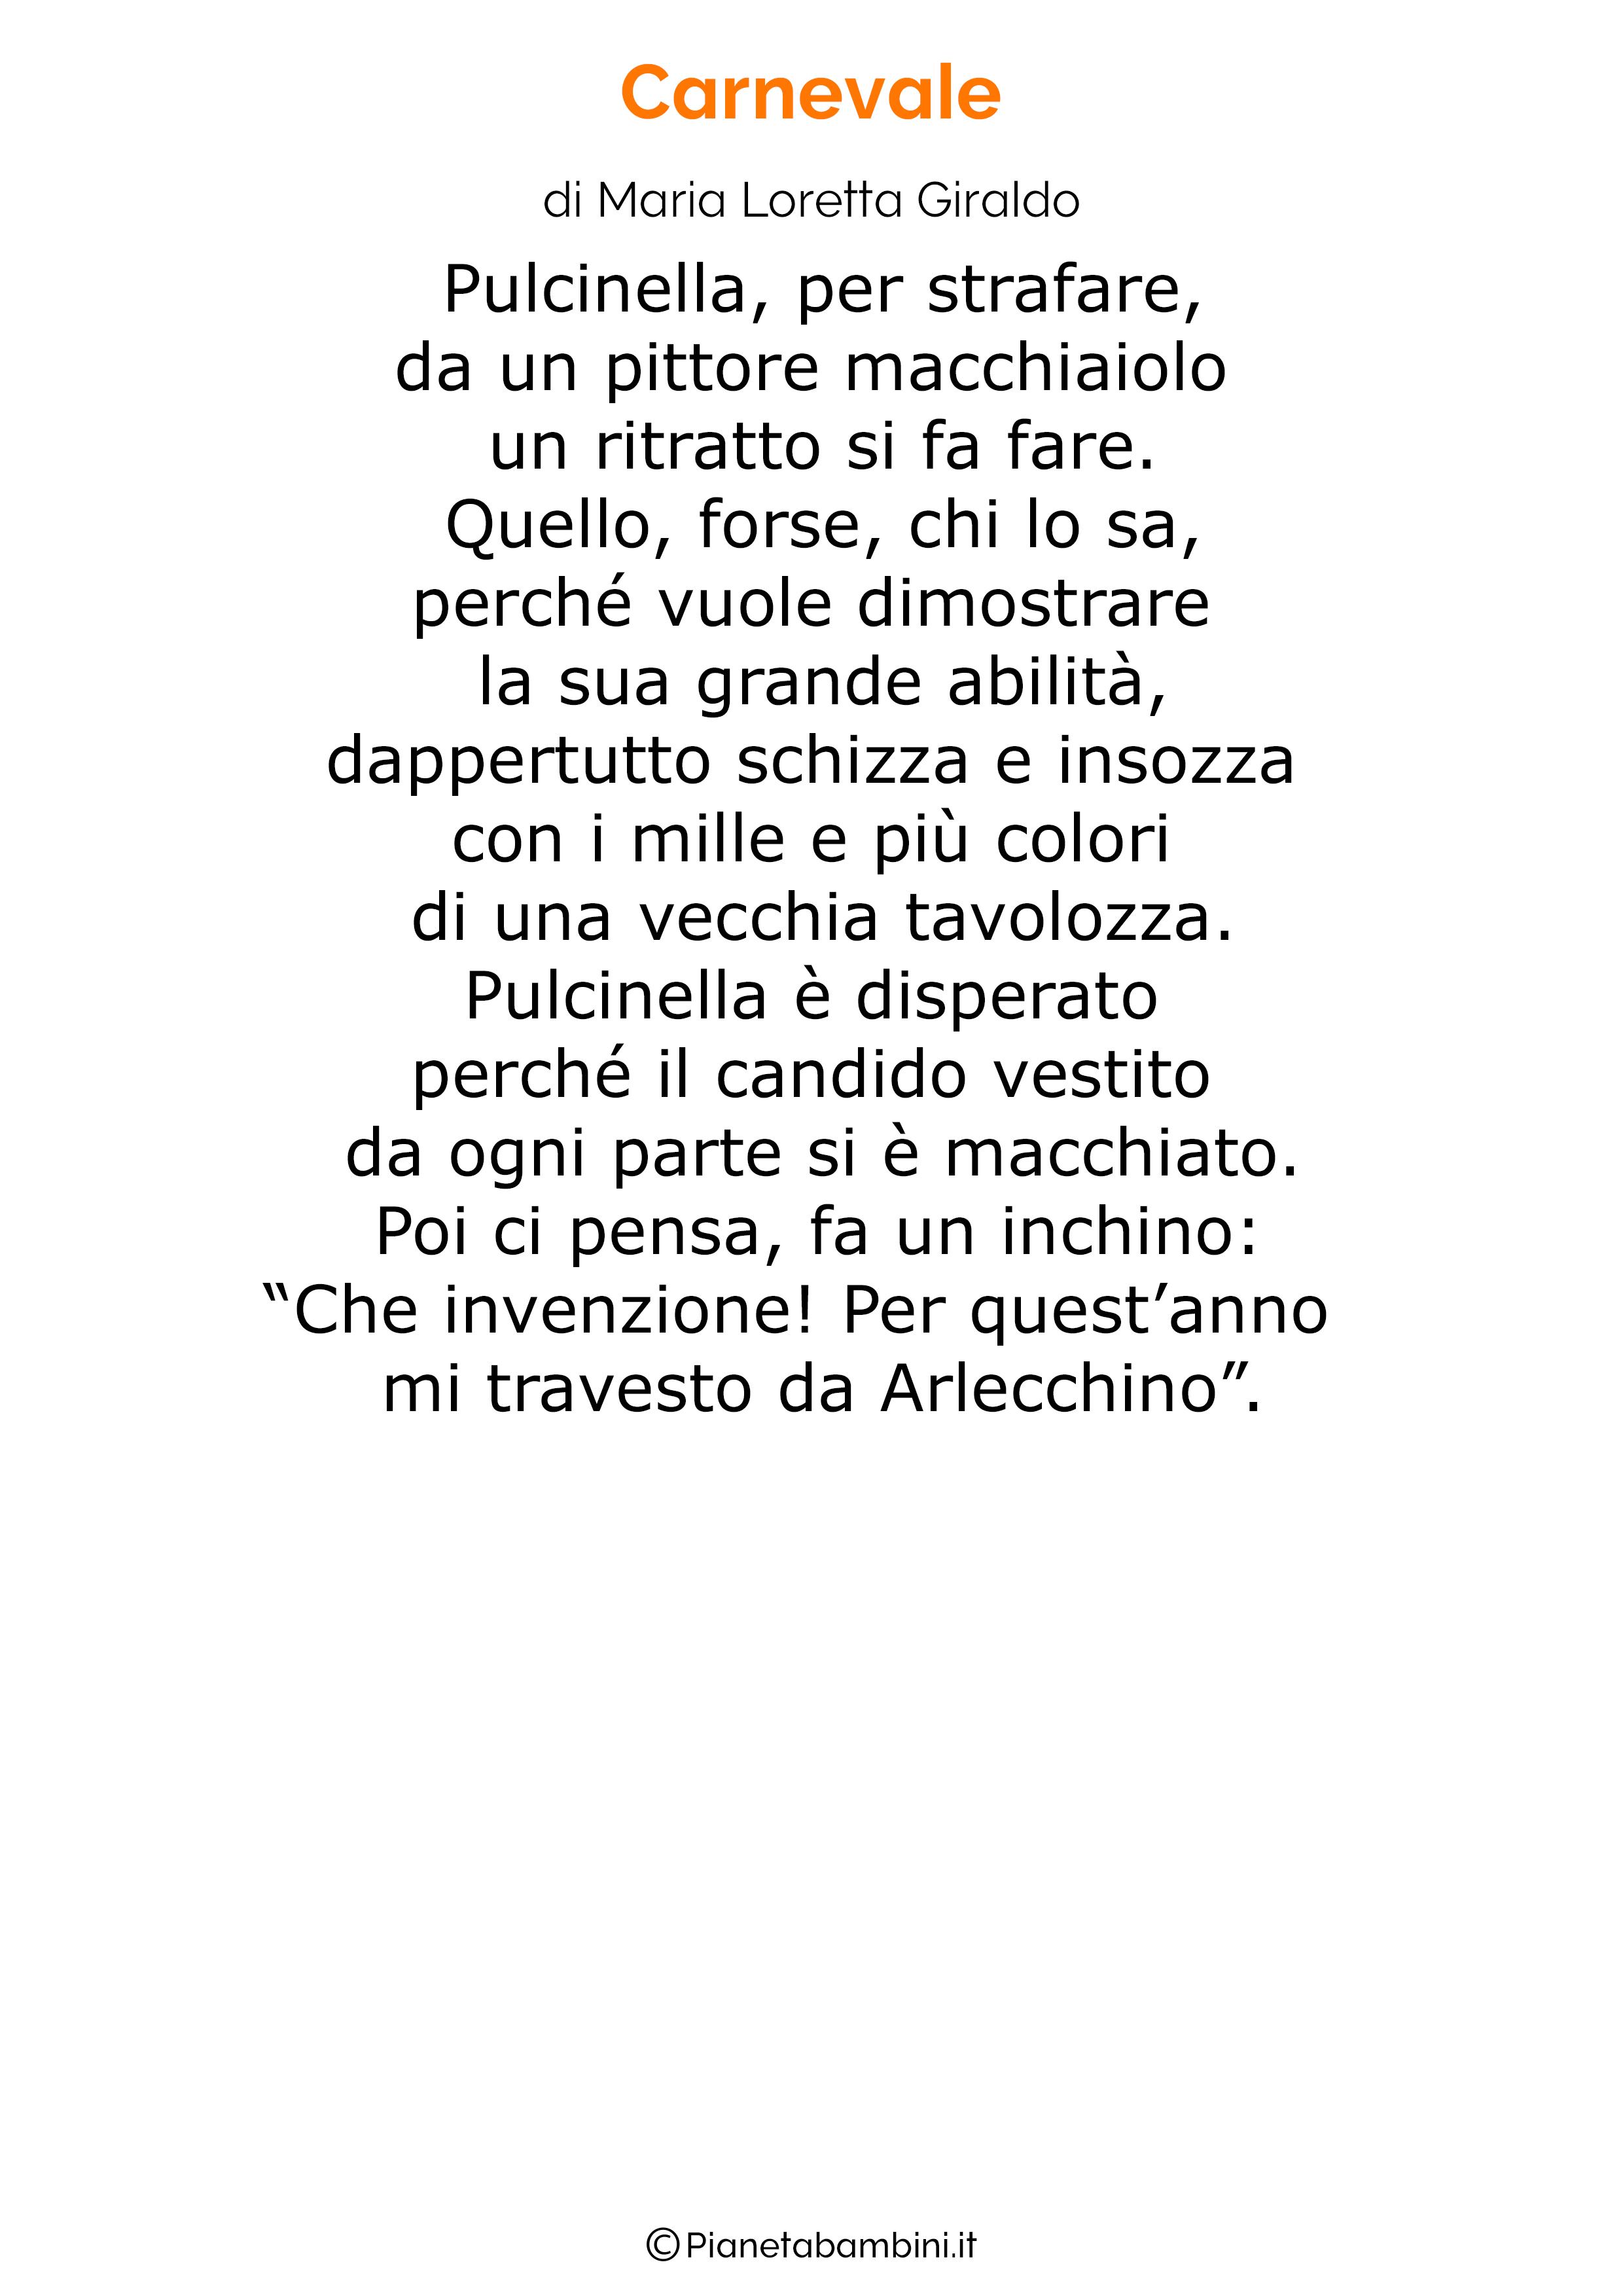 Poesie di Carnevale per bambini 10